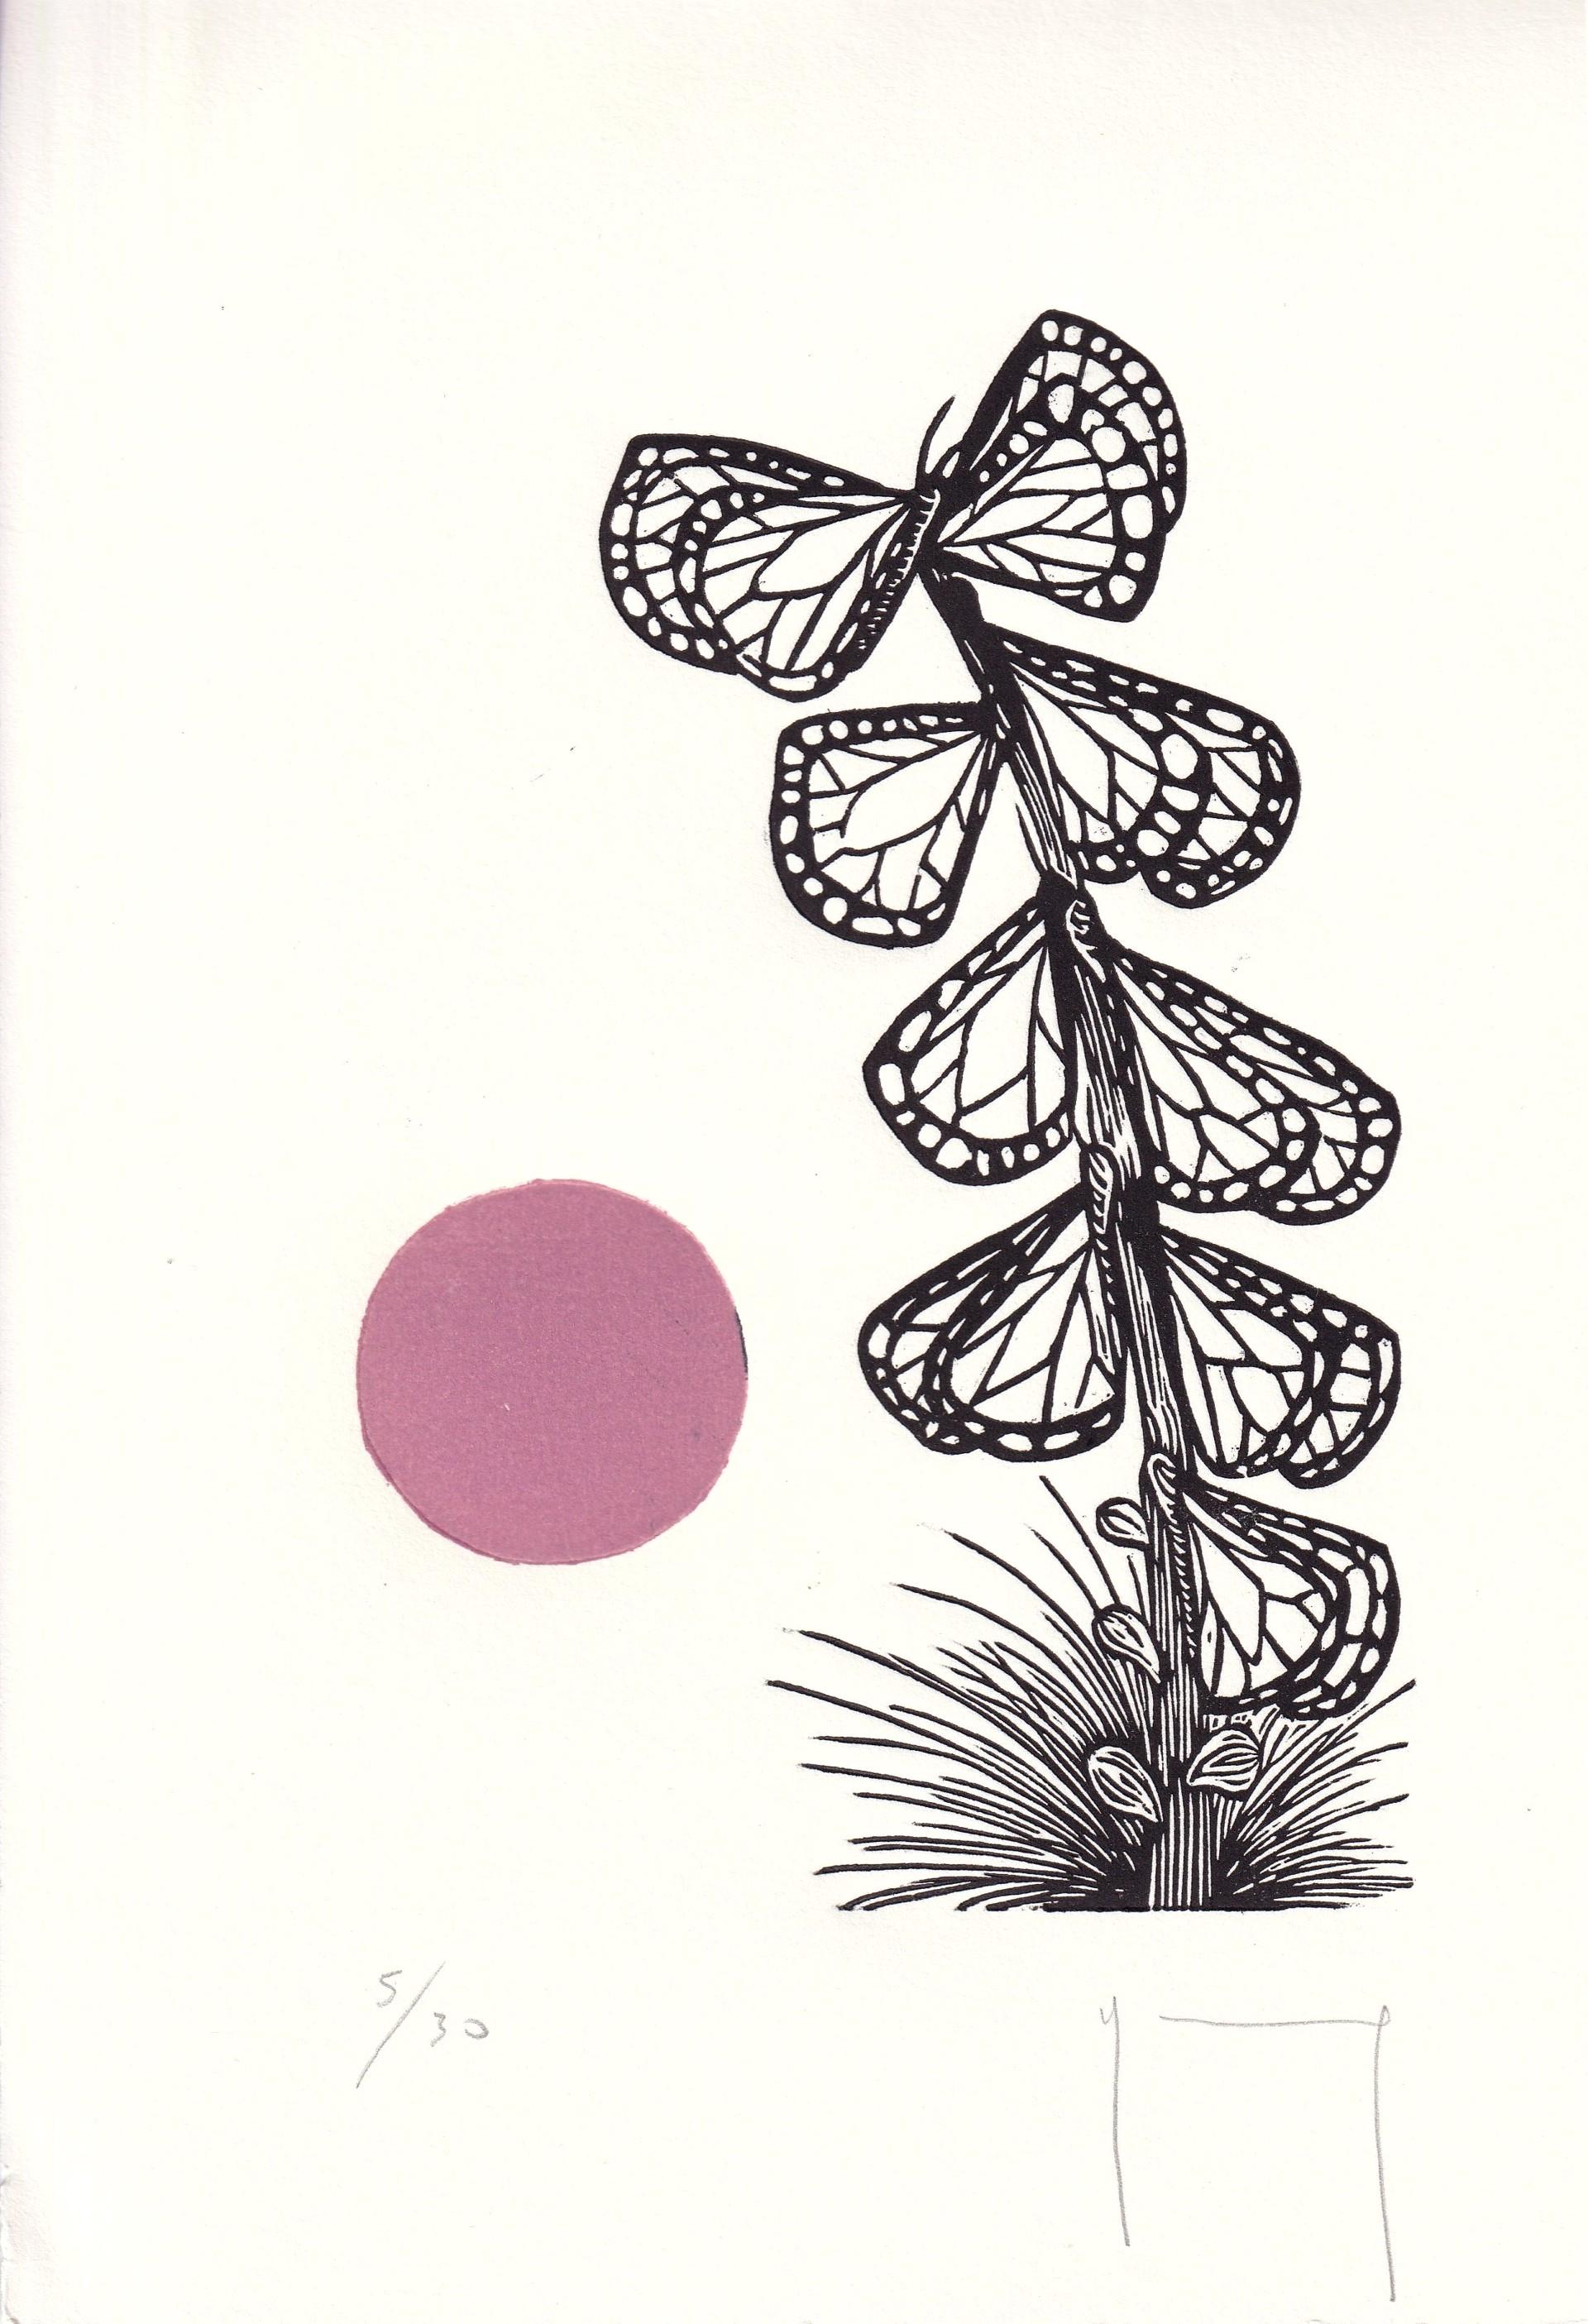 Serie Sol (Mariposas) by Miguel Jimenez Martinez